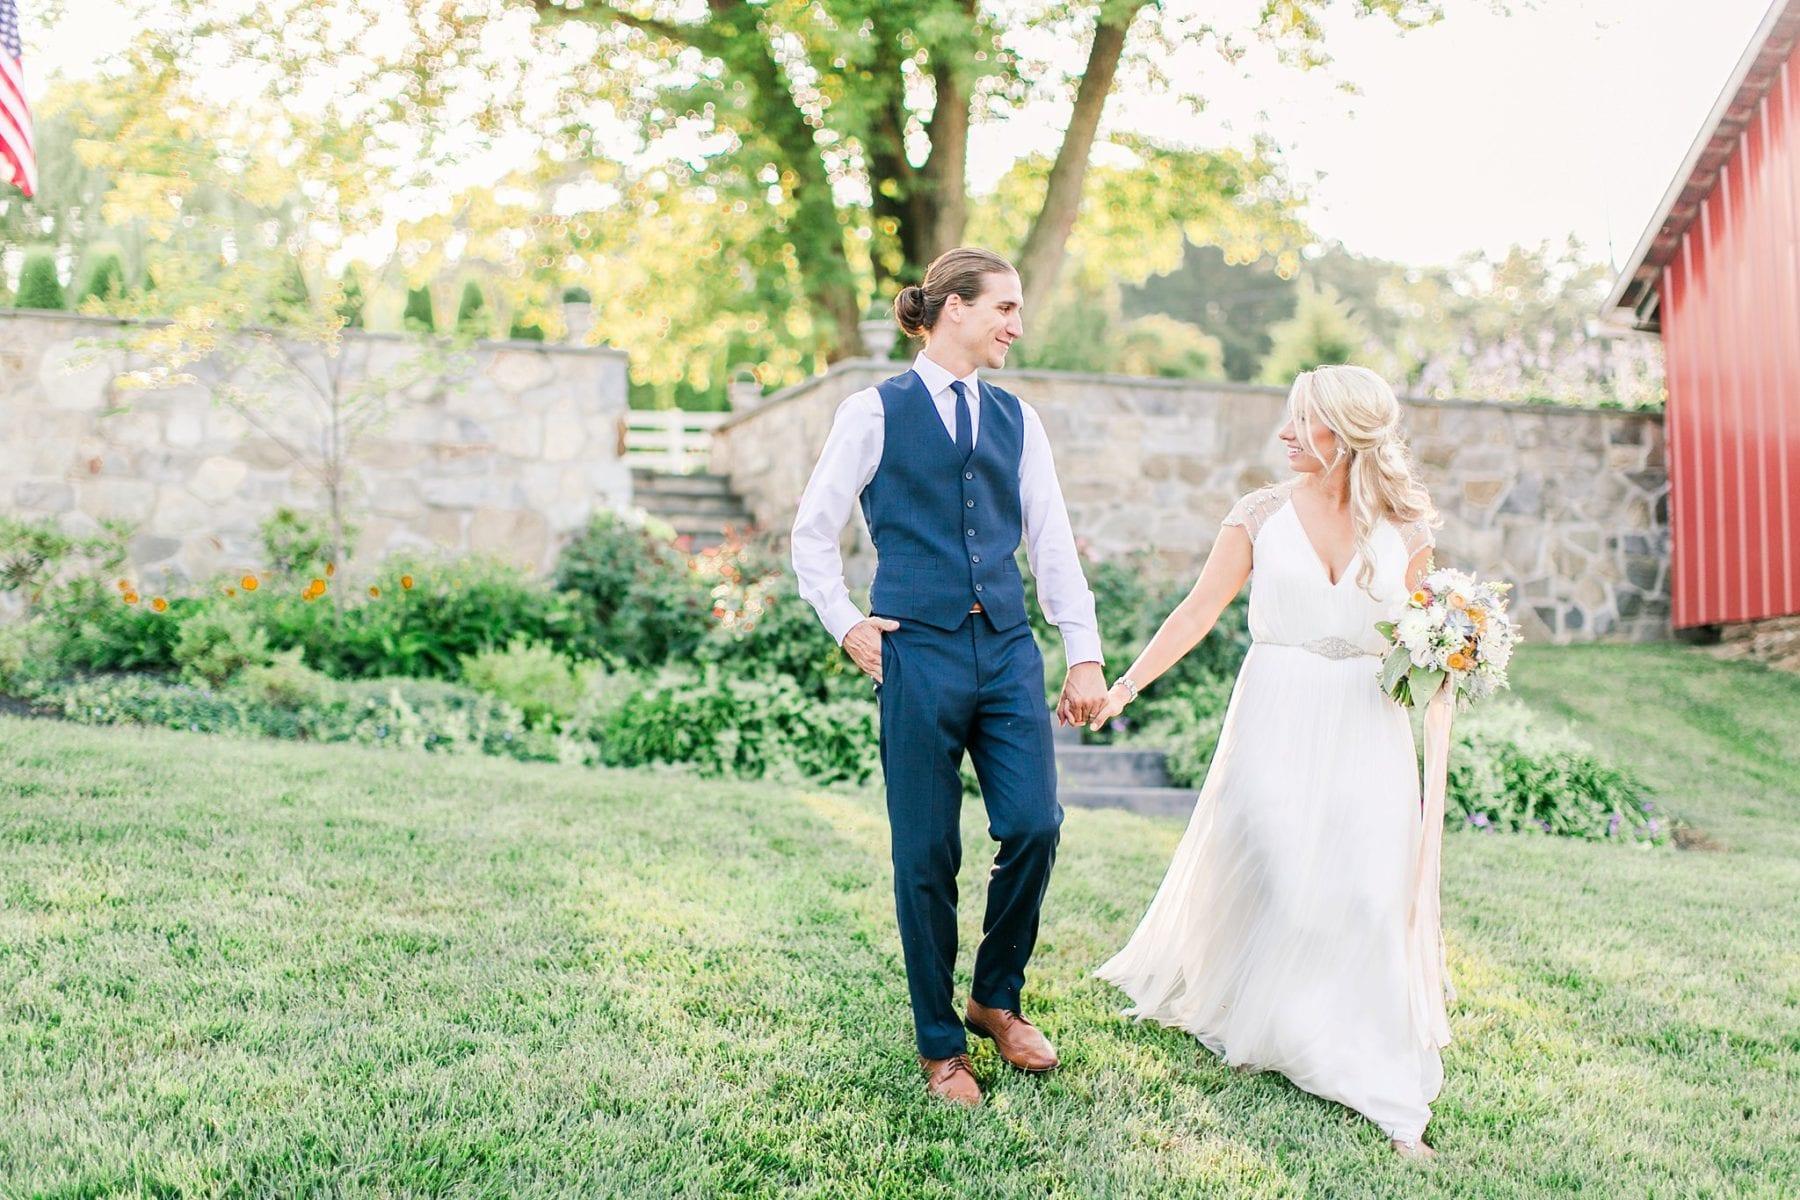 Pond View Farm Wedding Photos Maryland Wedding Photographer Kristen & Ryan Megan Kelsey Photography Blog-238.jpg